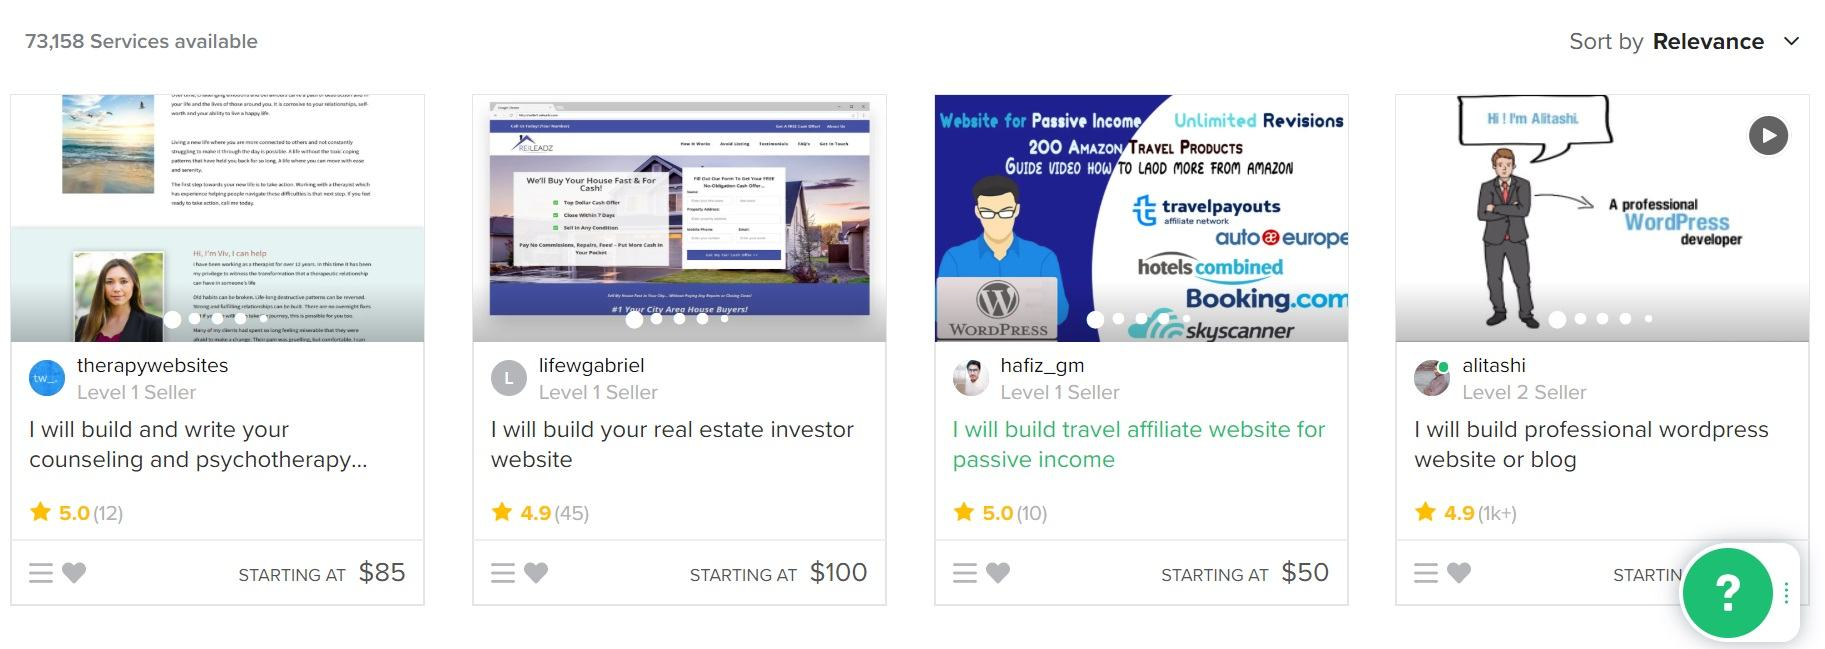 Fiverr Screenshot Build a Website